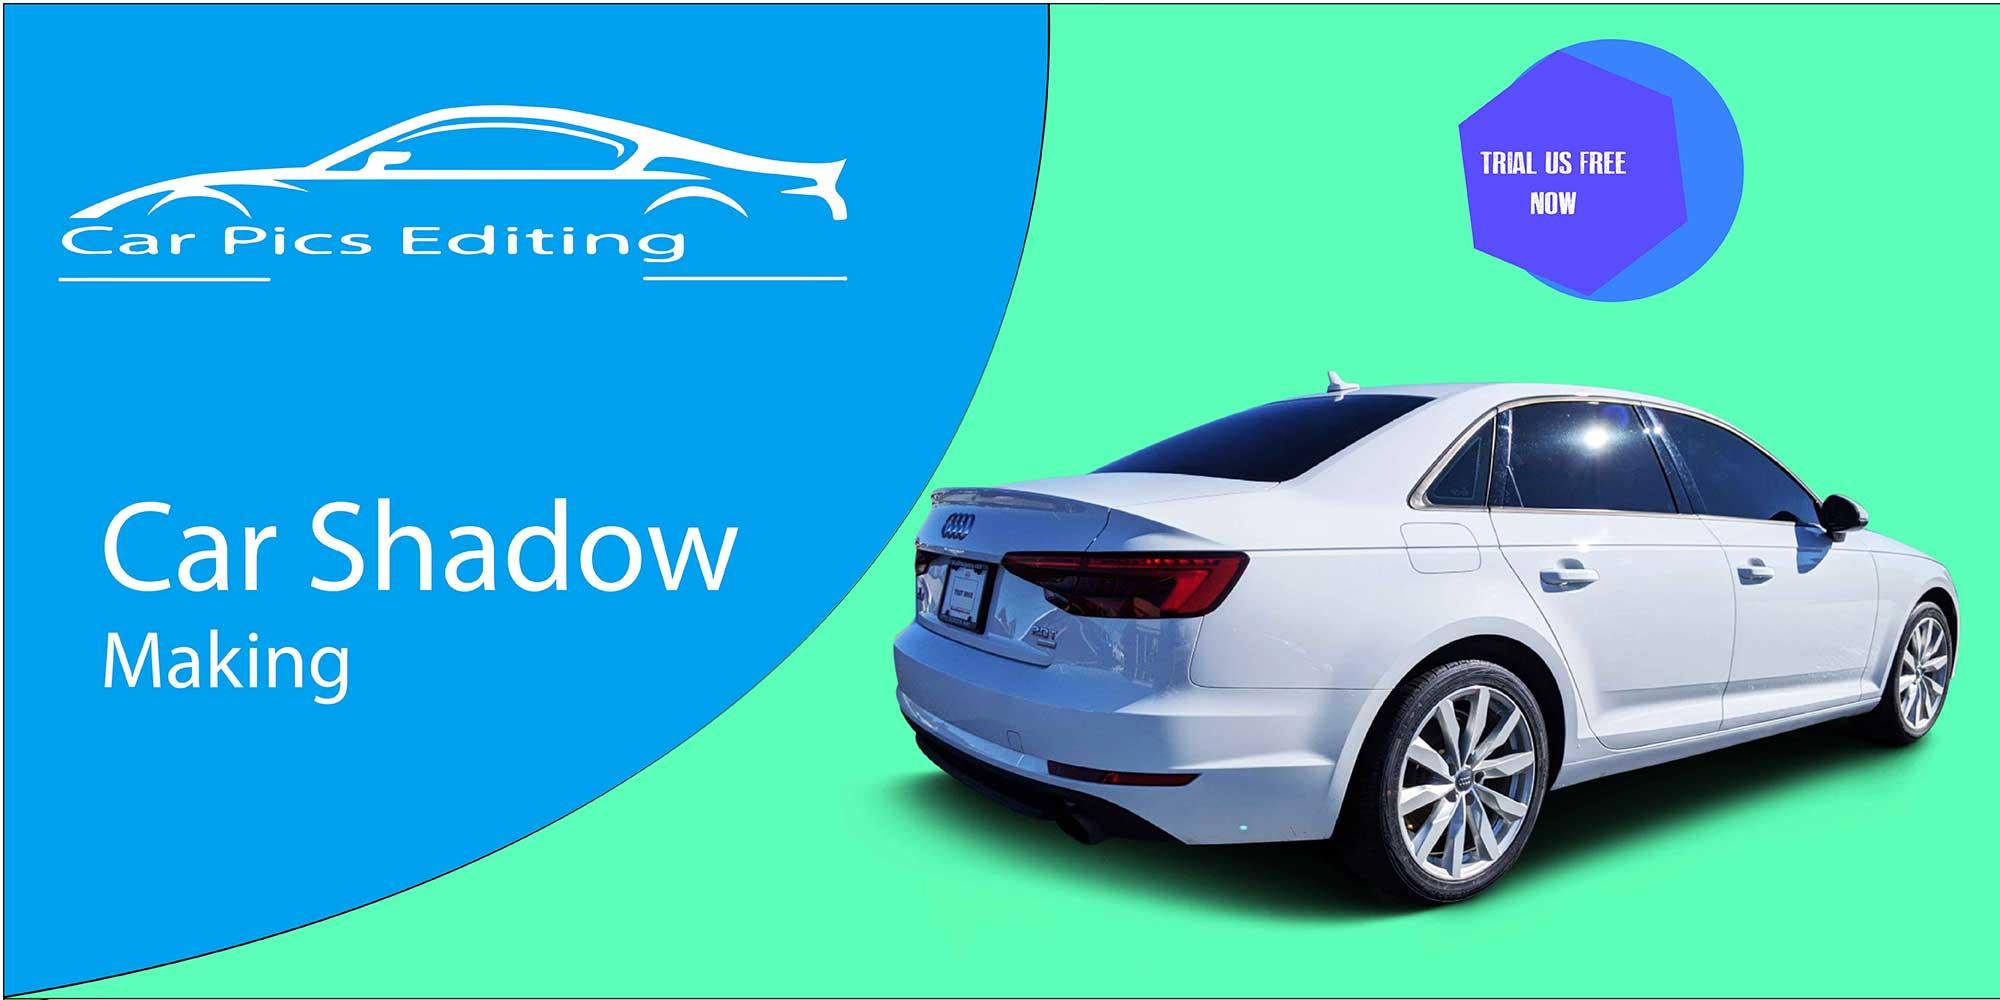 Ways Car Shadow Making Can Make You Invincible 4